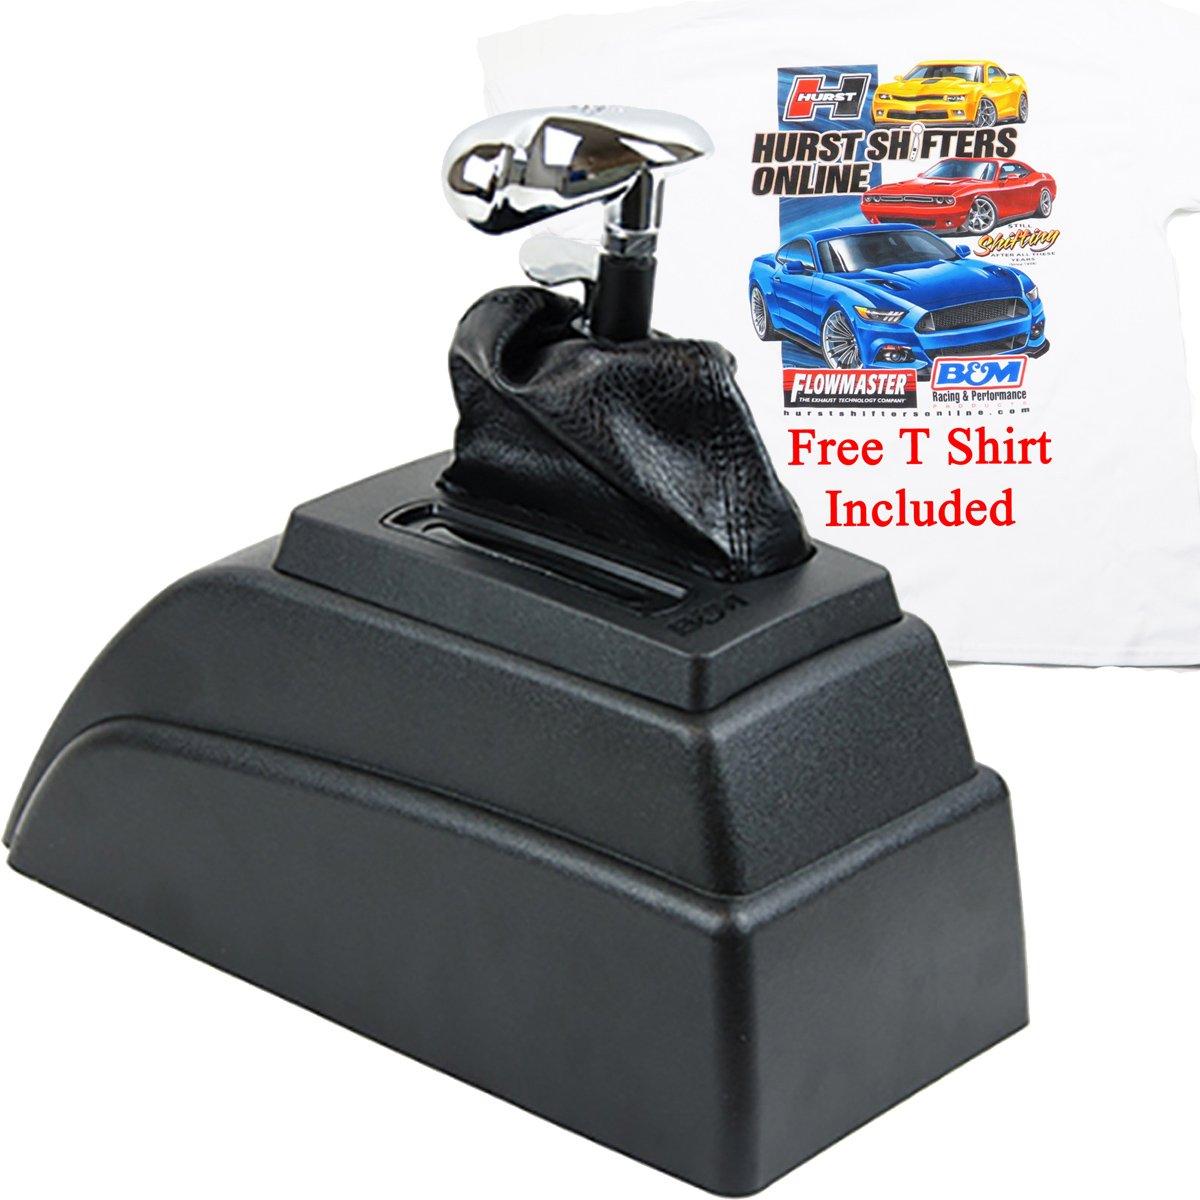 b m 80885 hammer automatic ratchet shifter plus t shirt. Black Bedroom Furniture Sets. Home Design Ideas